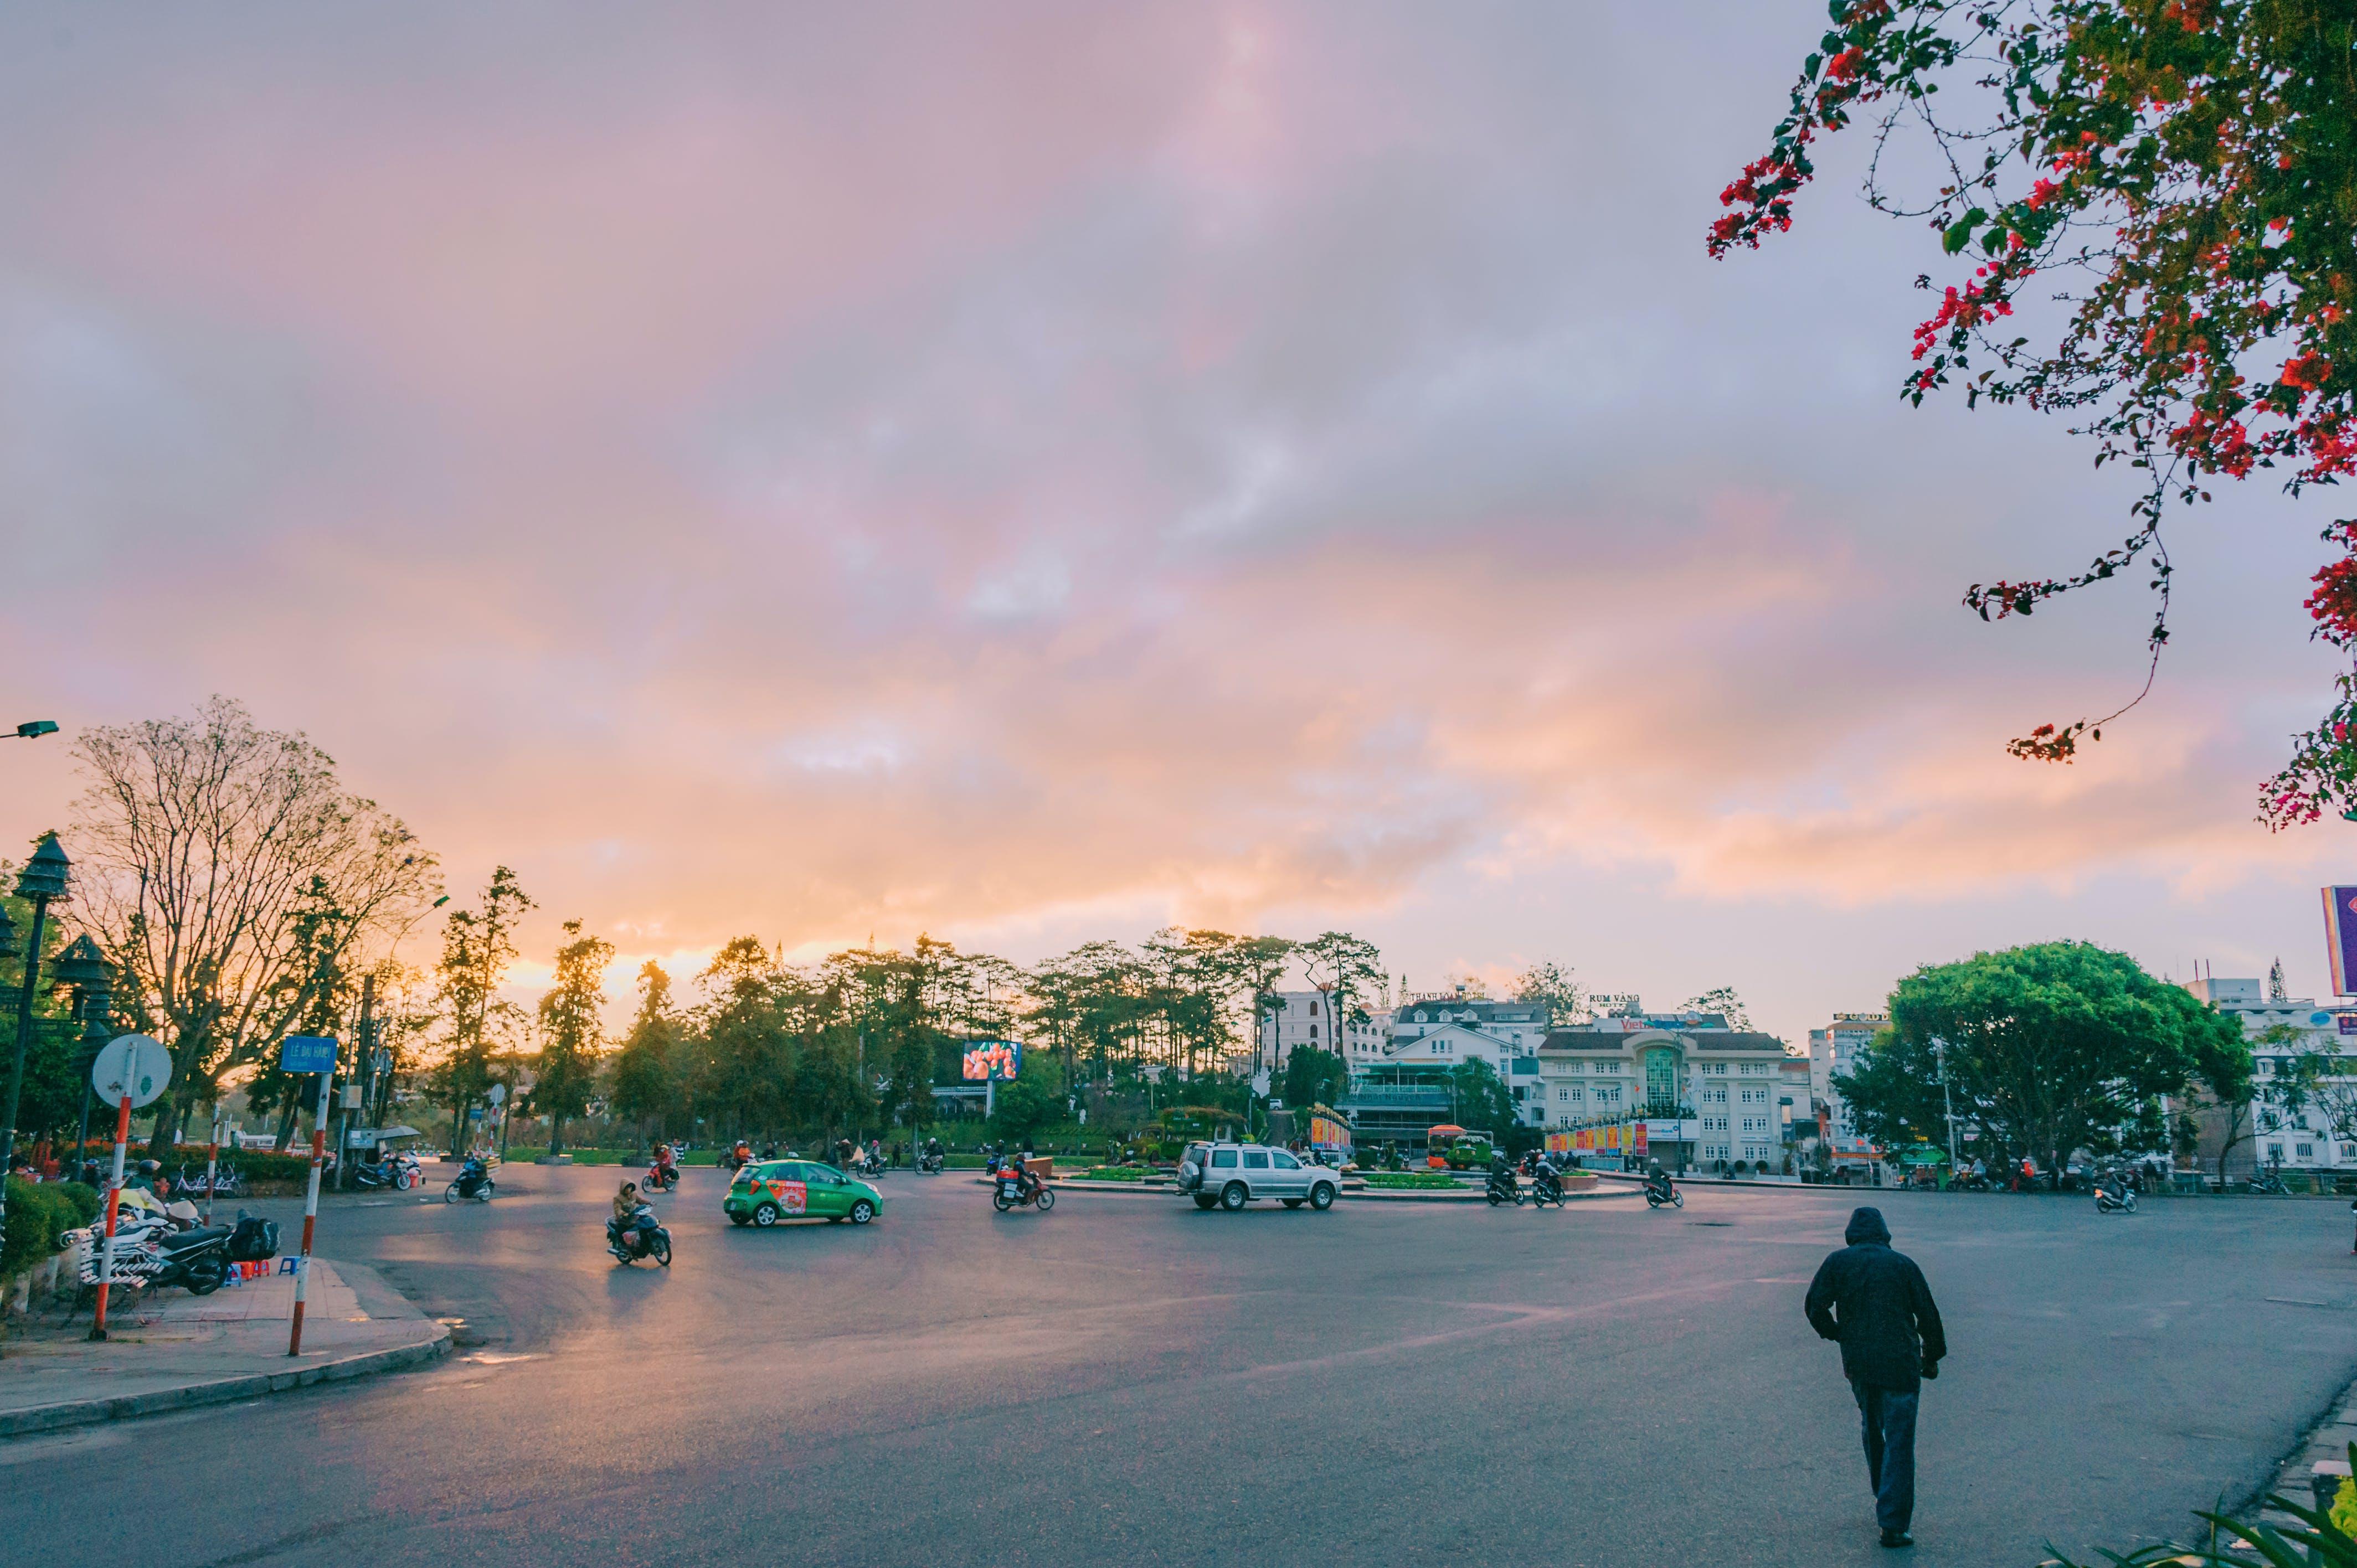 Gratis stockfoto met architectuur, auto's, bomen, gebouwen